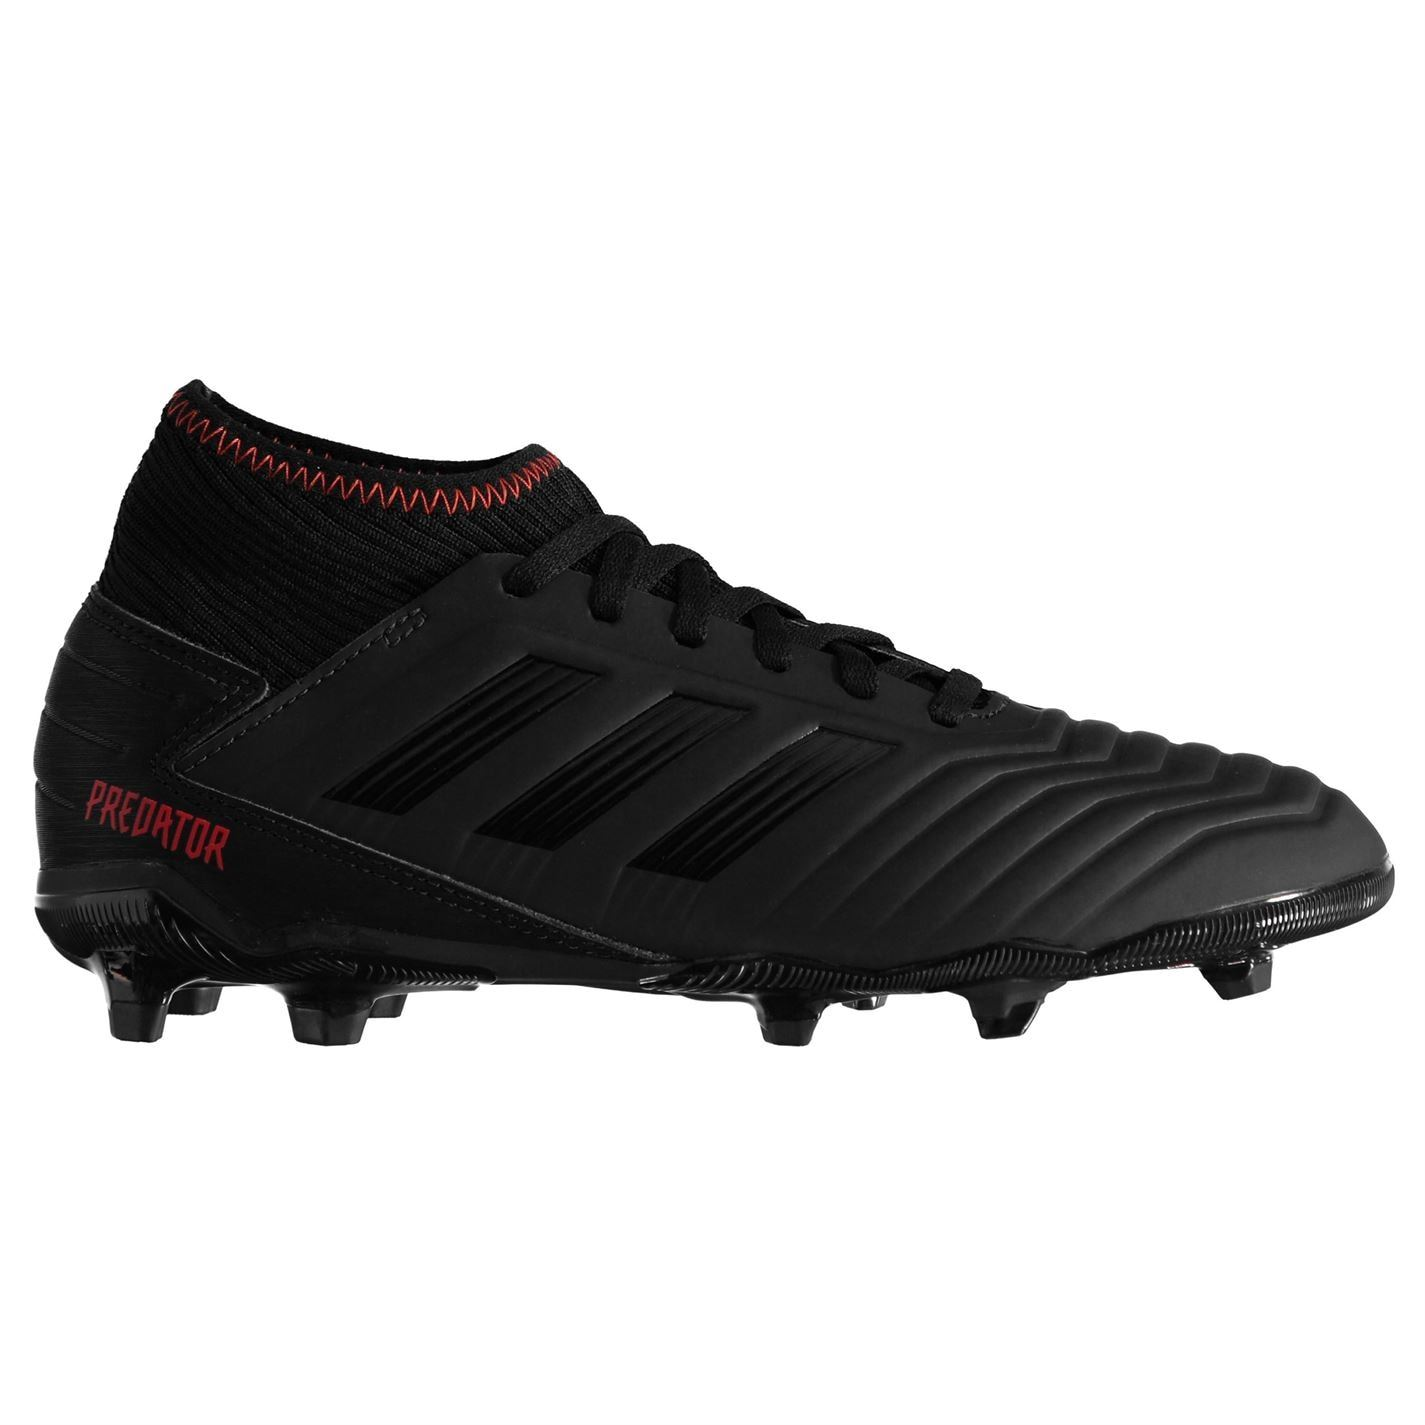 Adidas-Predator-Junior-19-3-FG-Firm-Ground-football-boots-Boys-Football-Chaussures miniature 5